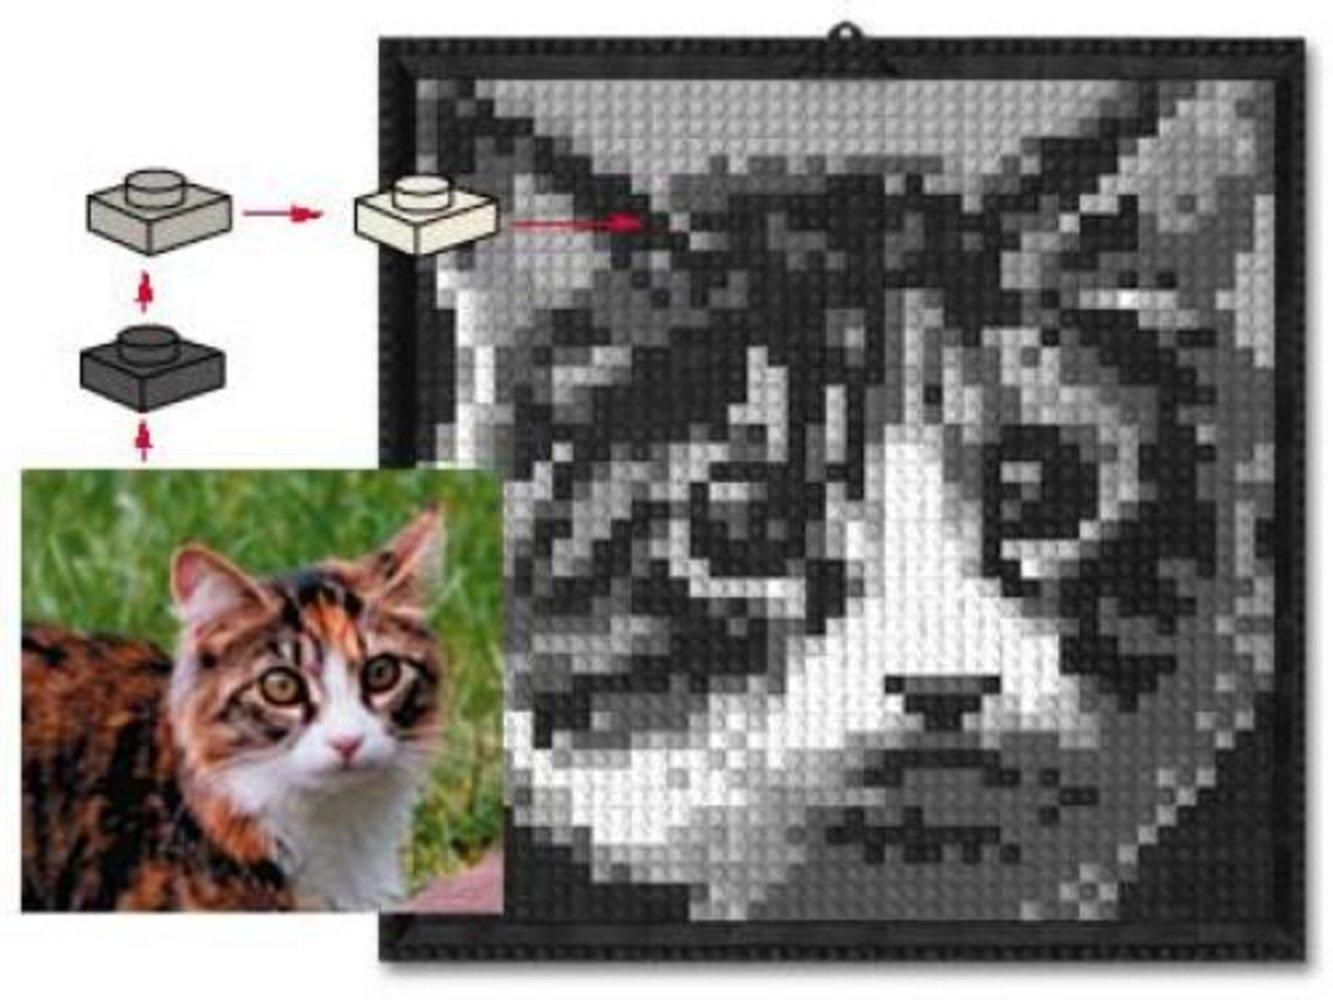 Lego Mosaic Cat